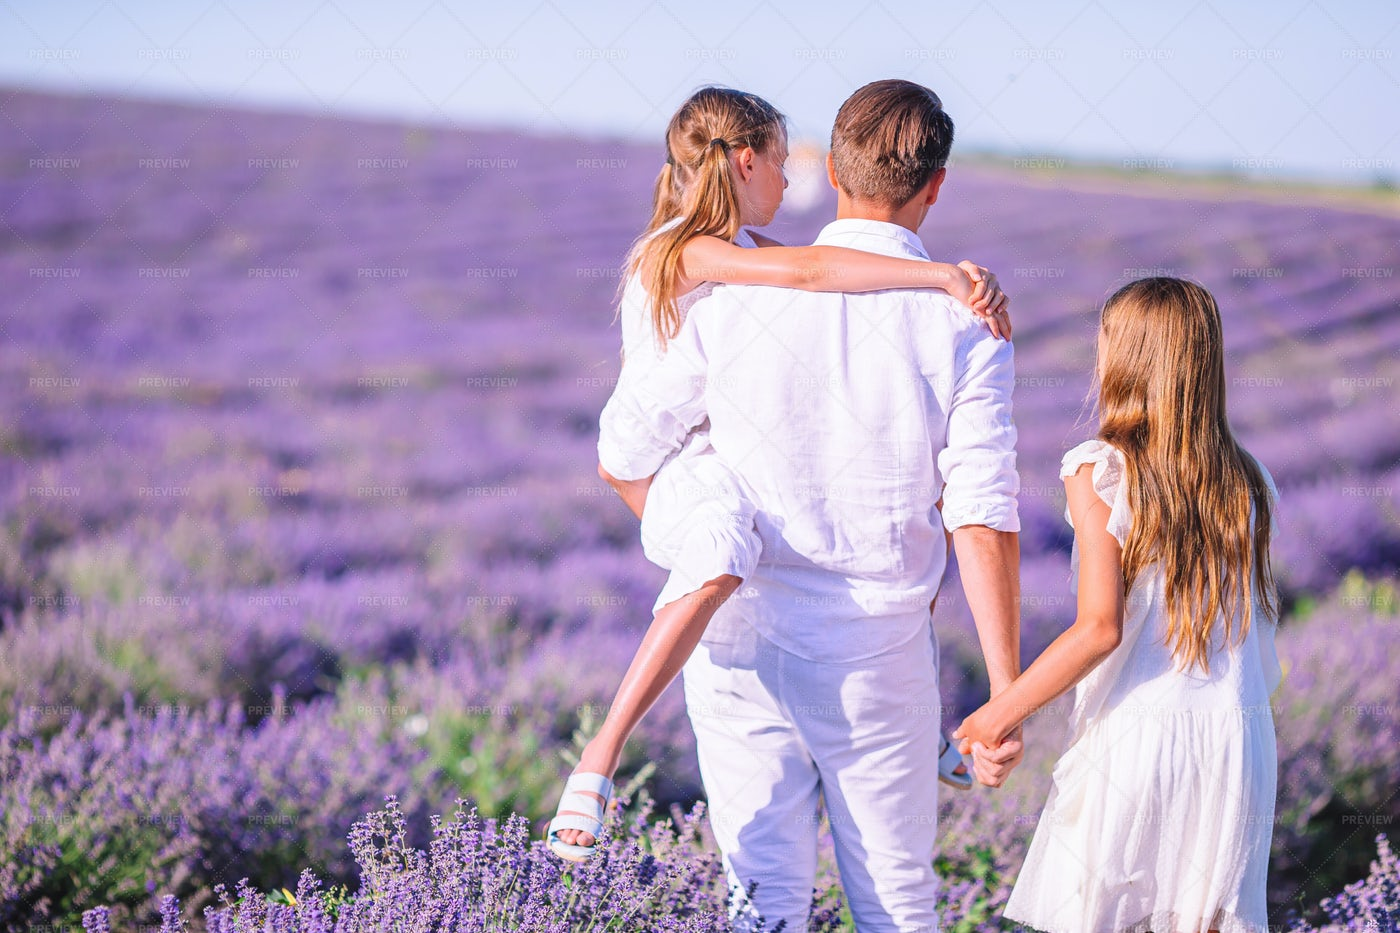 Walking Through Lavender: Stock Photos